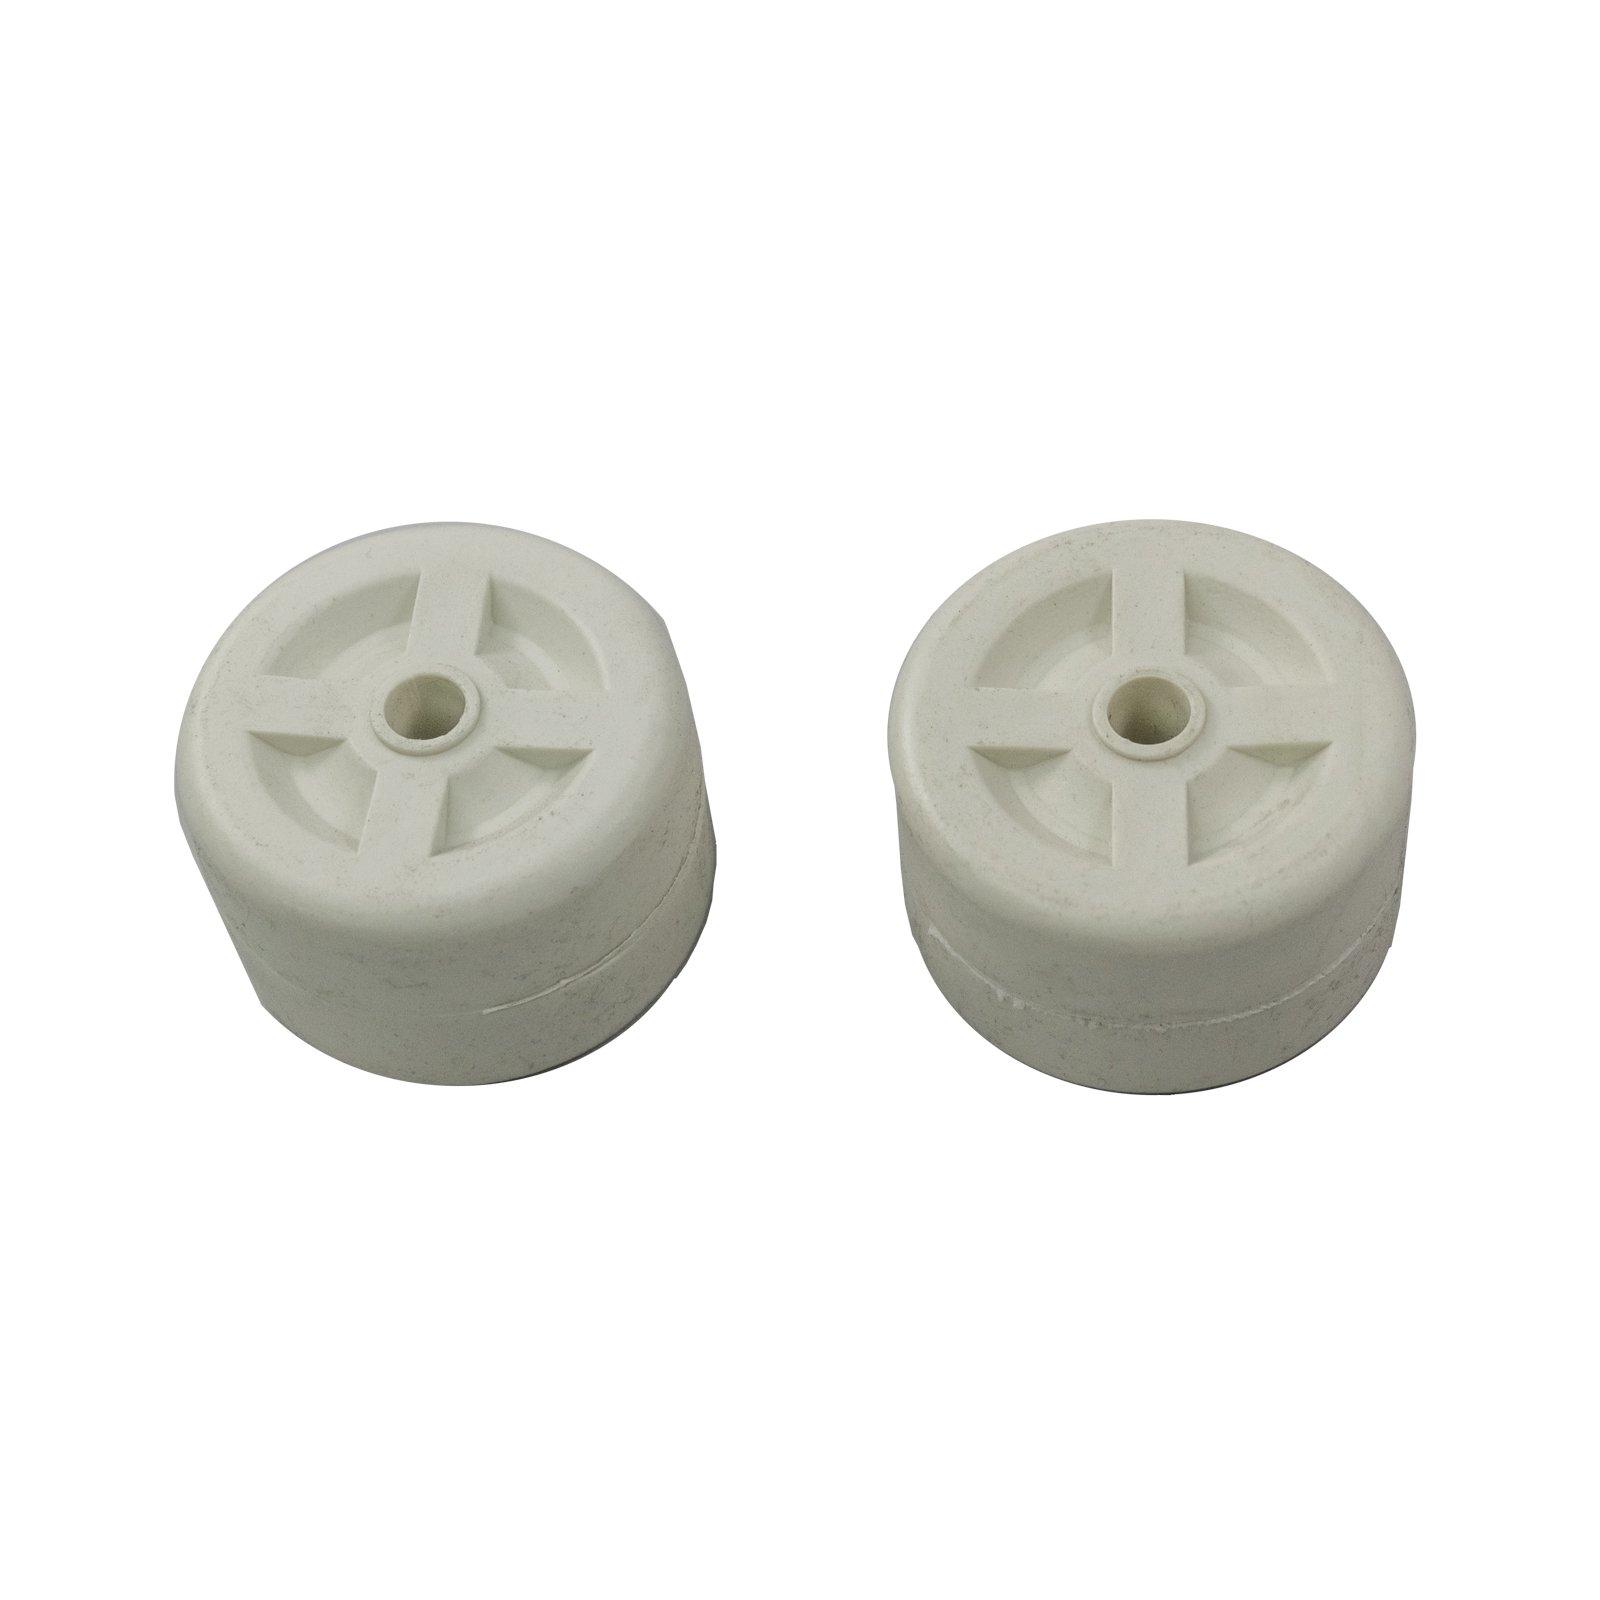 Patio Heater Hiland 2 Piece Plastic Wheels In White FCPTHP-PW-WT